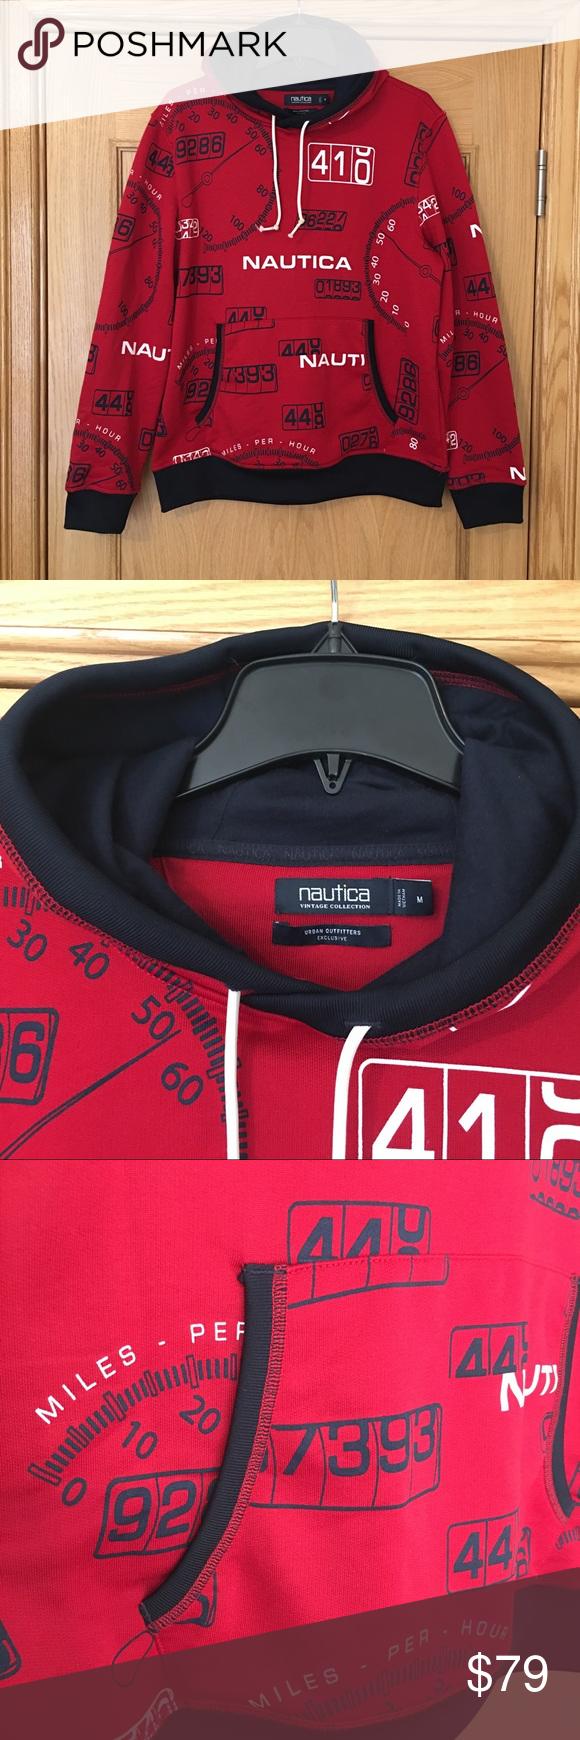 Nautica Vintage Collection Speedometer Hoodie Sz M Vintage Collection Red Sweatshirt Hoodie Hoodies